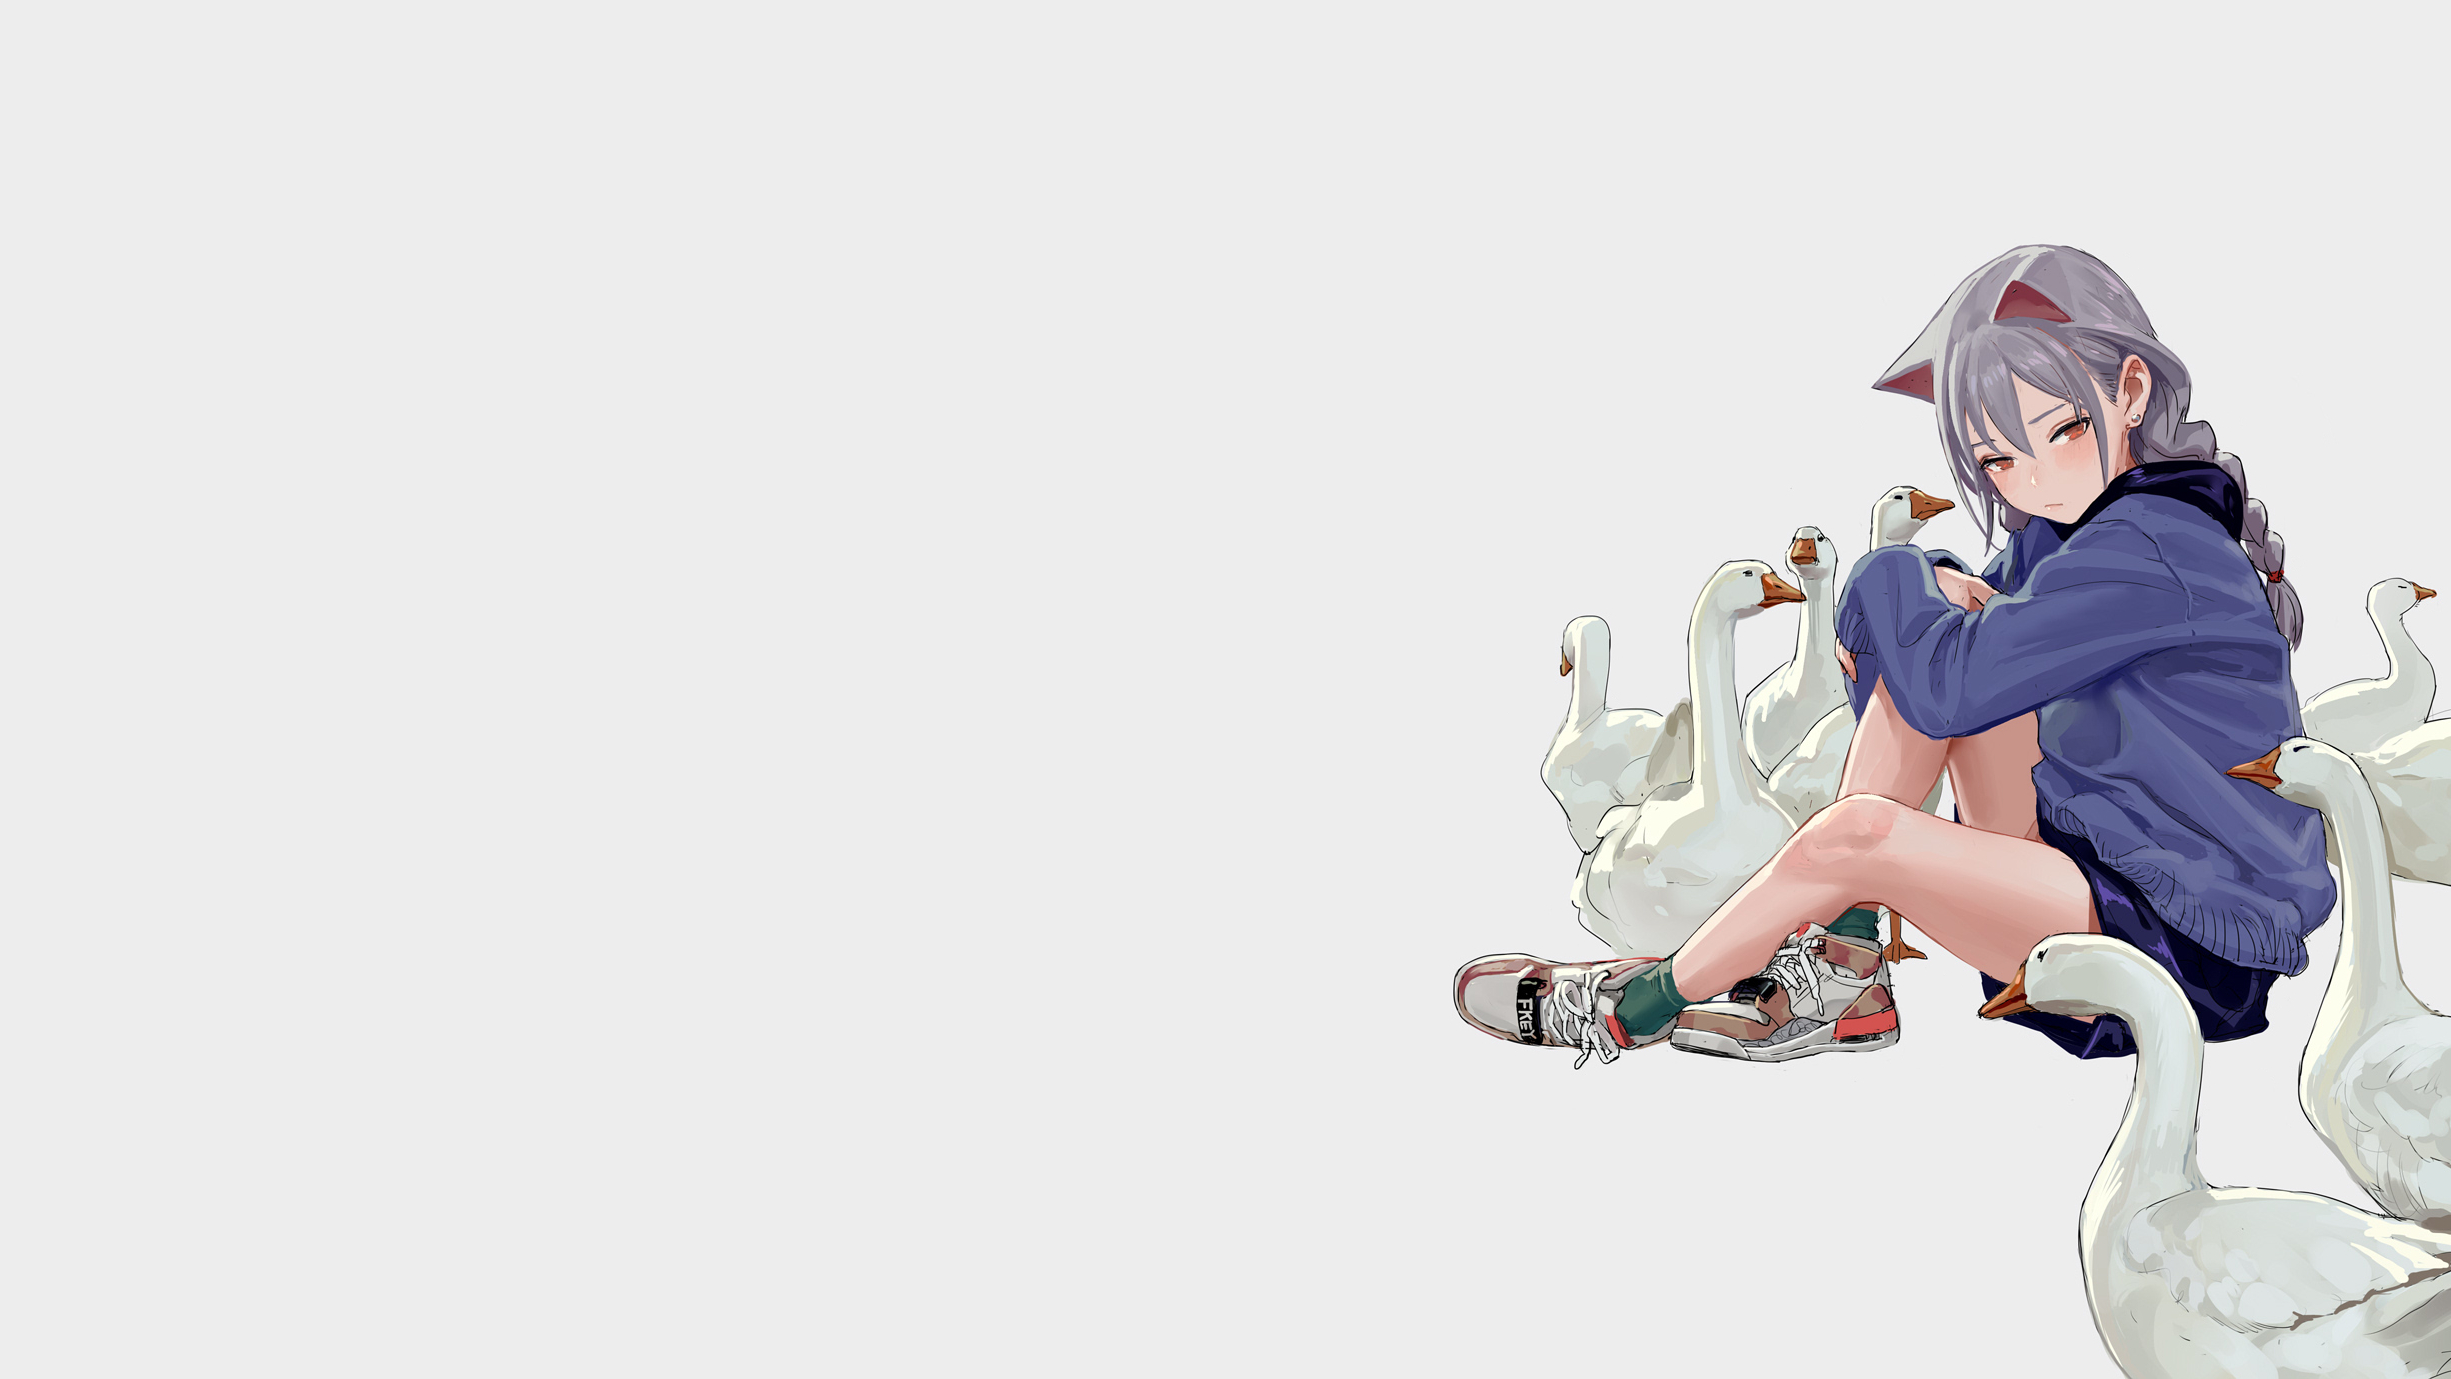 Anime 2451x1379 geese nekomimi anime girls anime animals birds sitting white background simple background